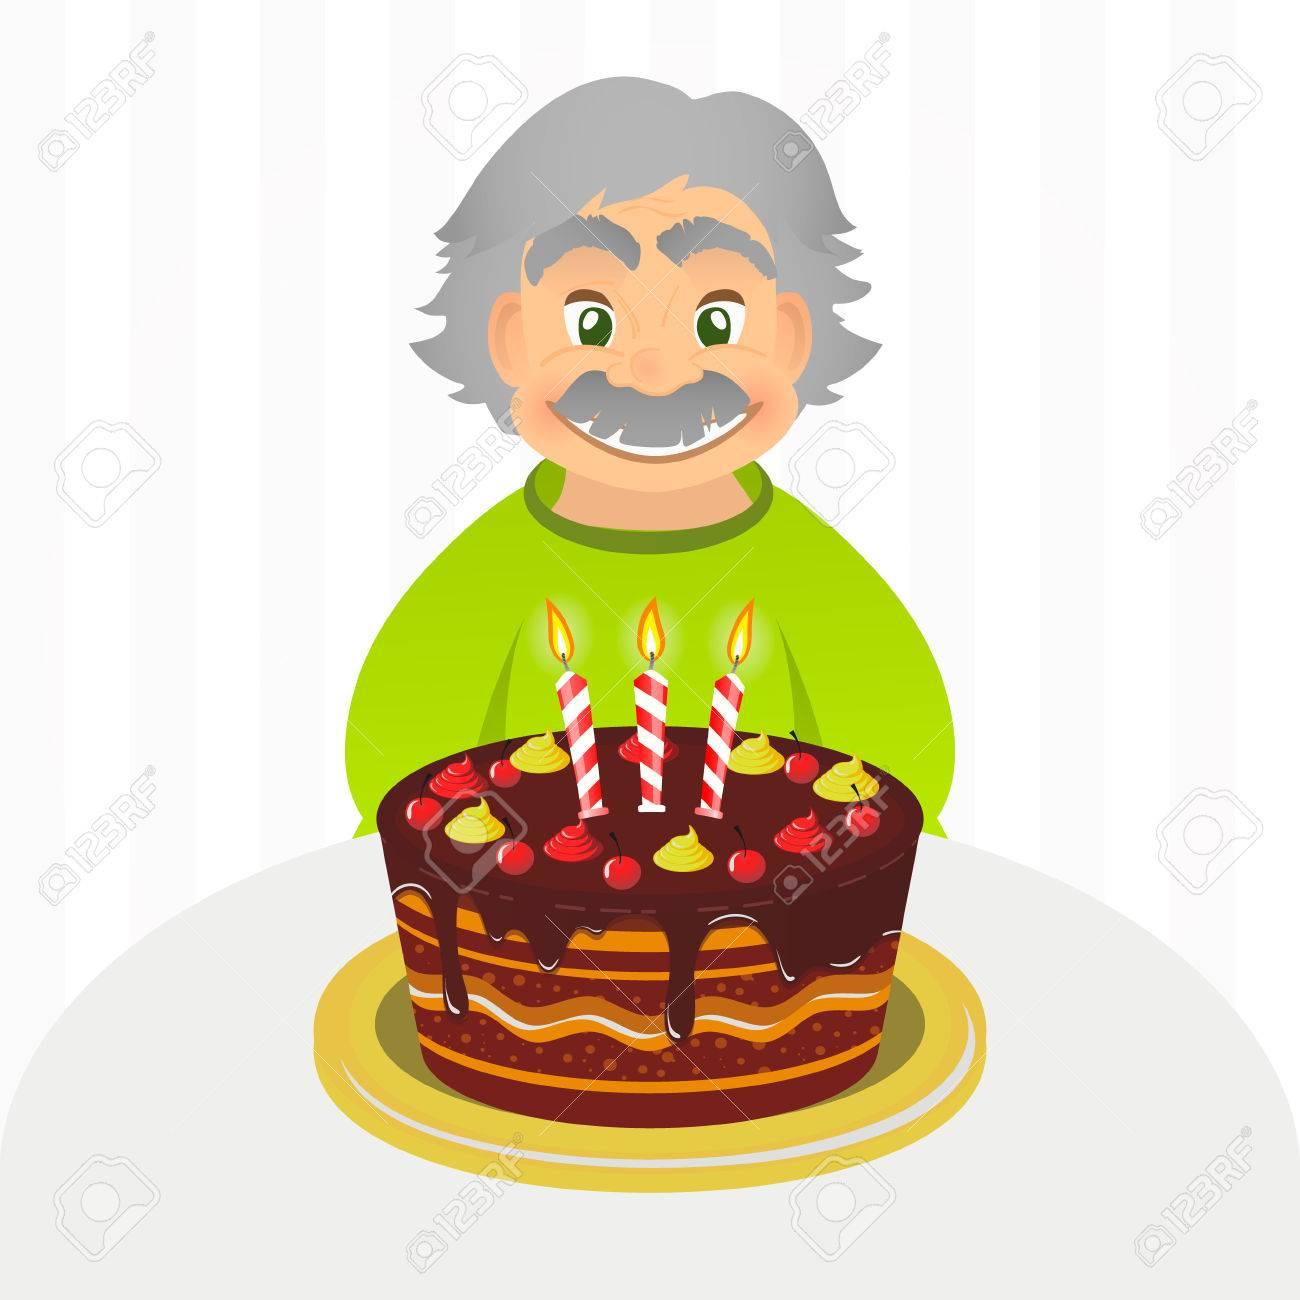 Old Man Celebrating Birthday Senior Man With Chocolate Cake